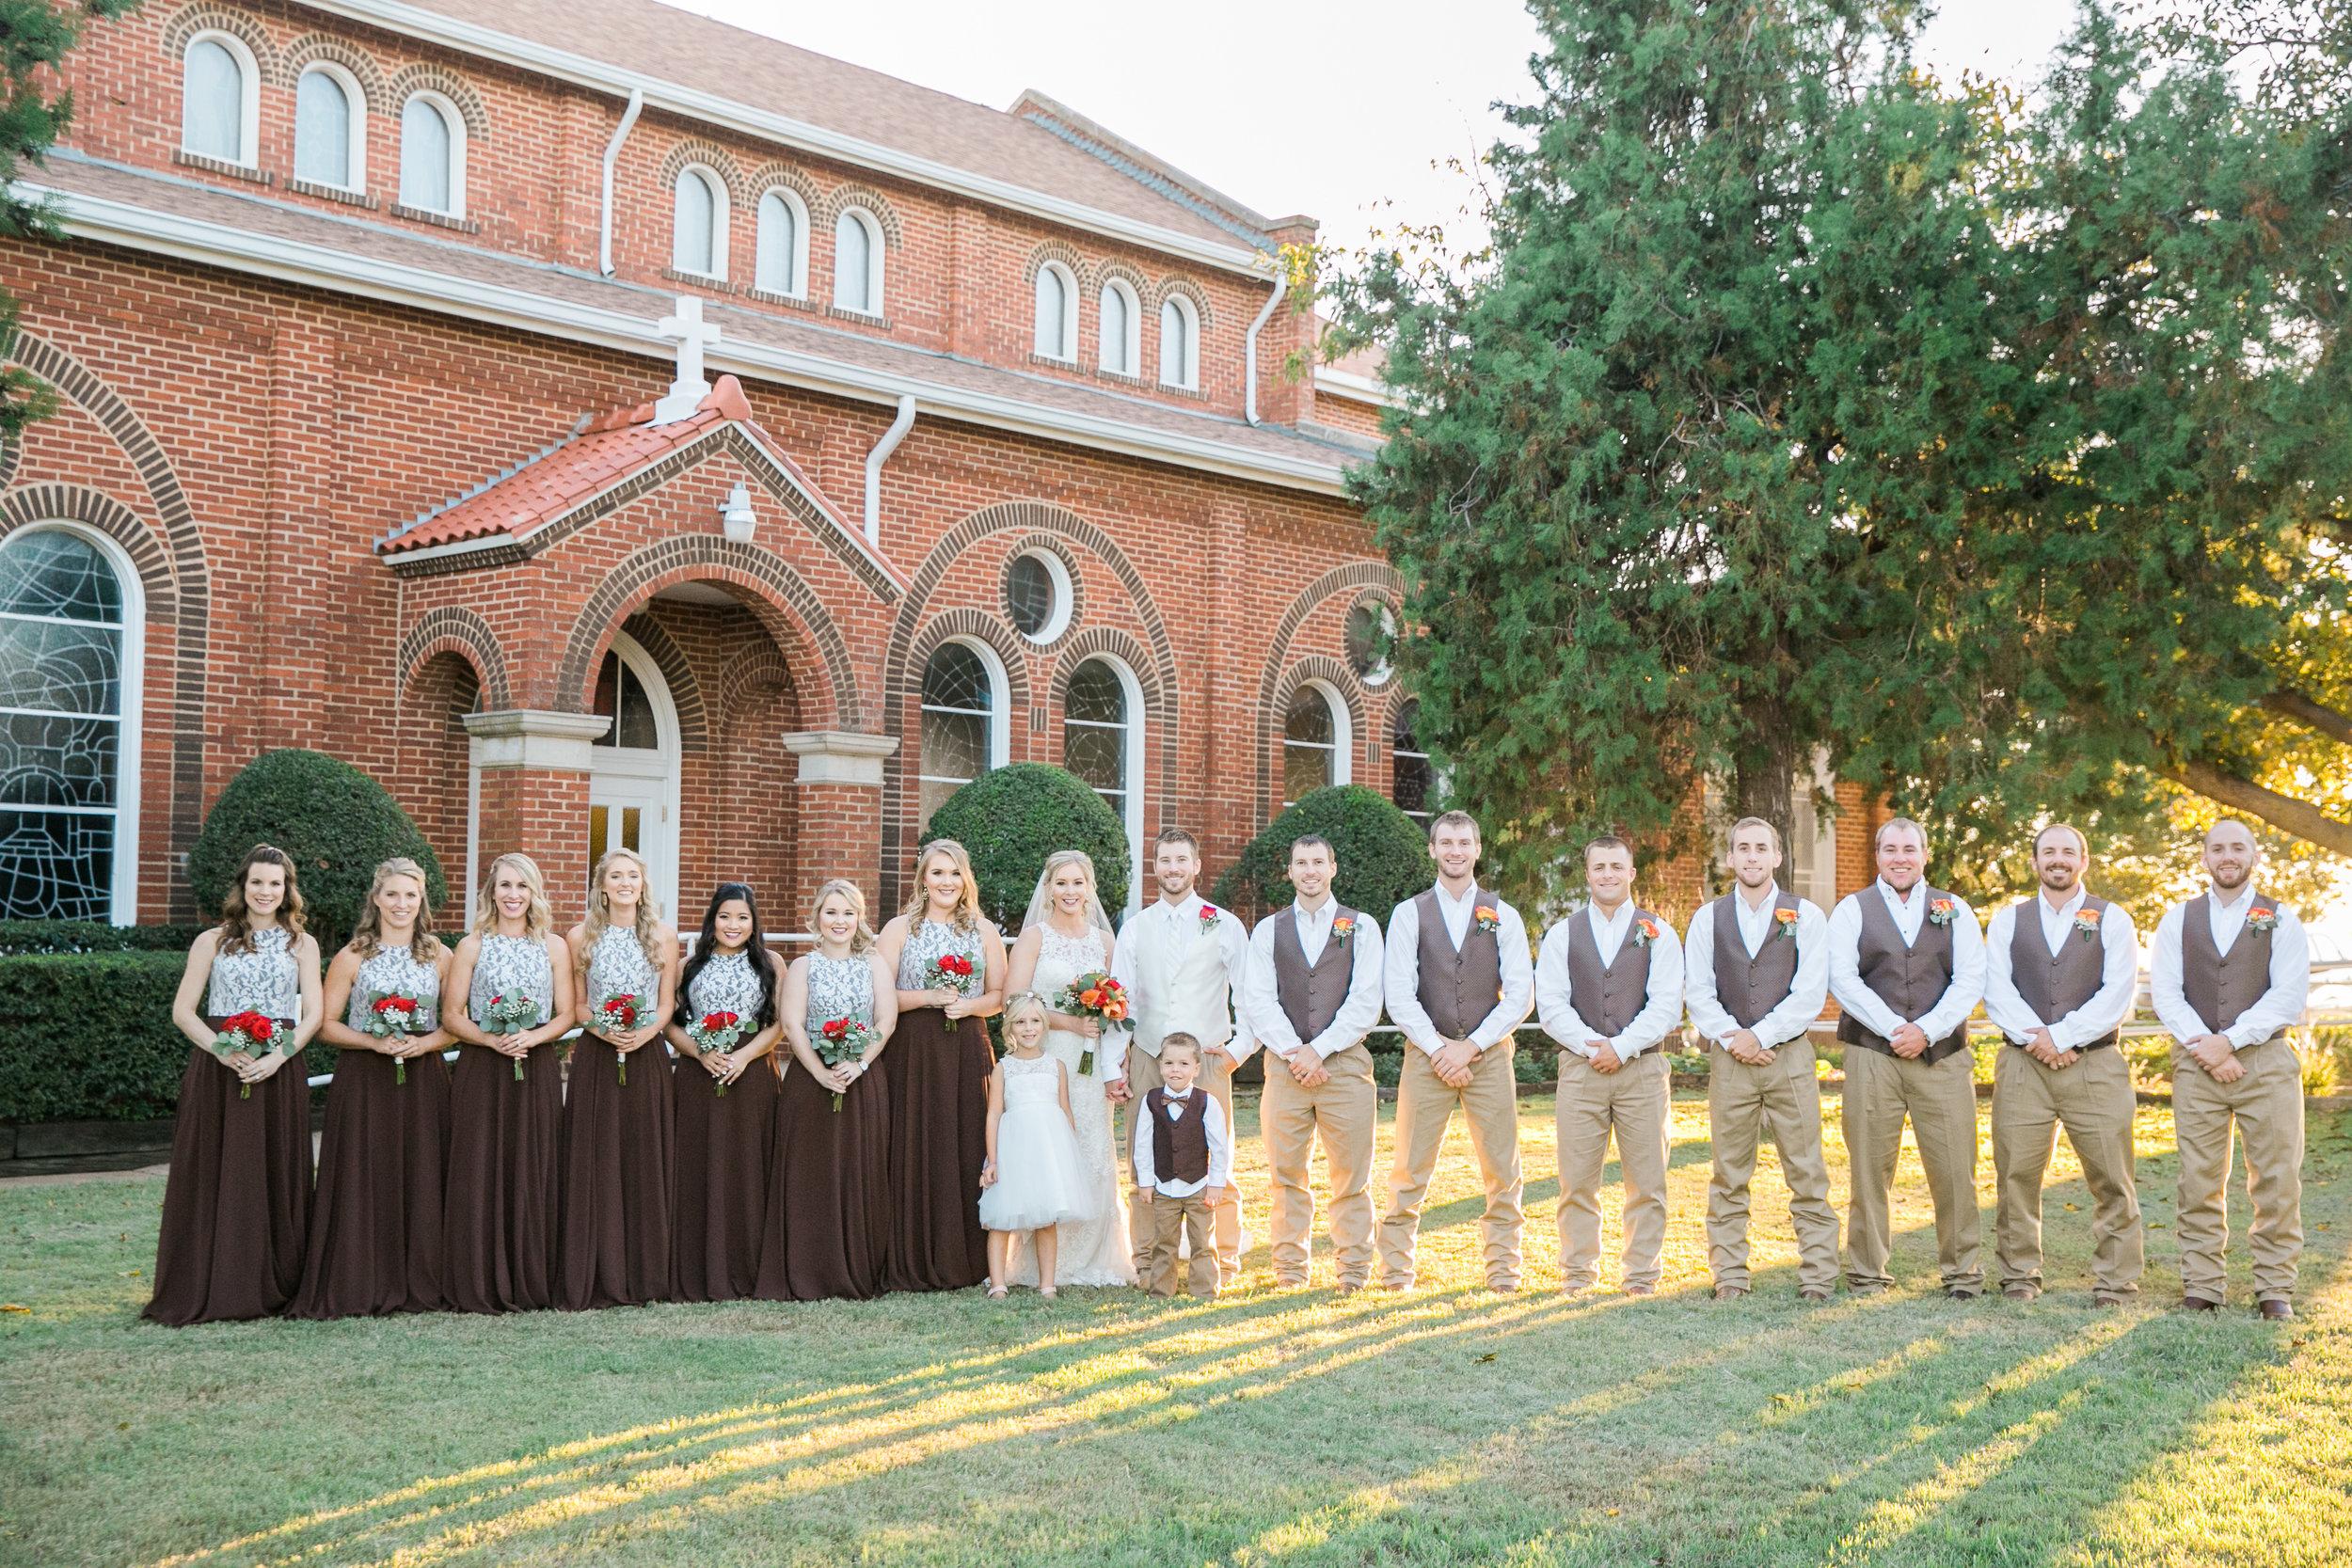 Bailey-Nathan-Windthorst-Texas-Wedding-045.jpg